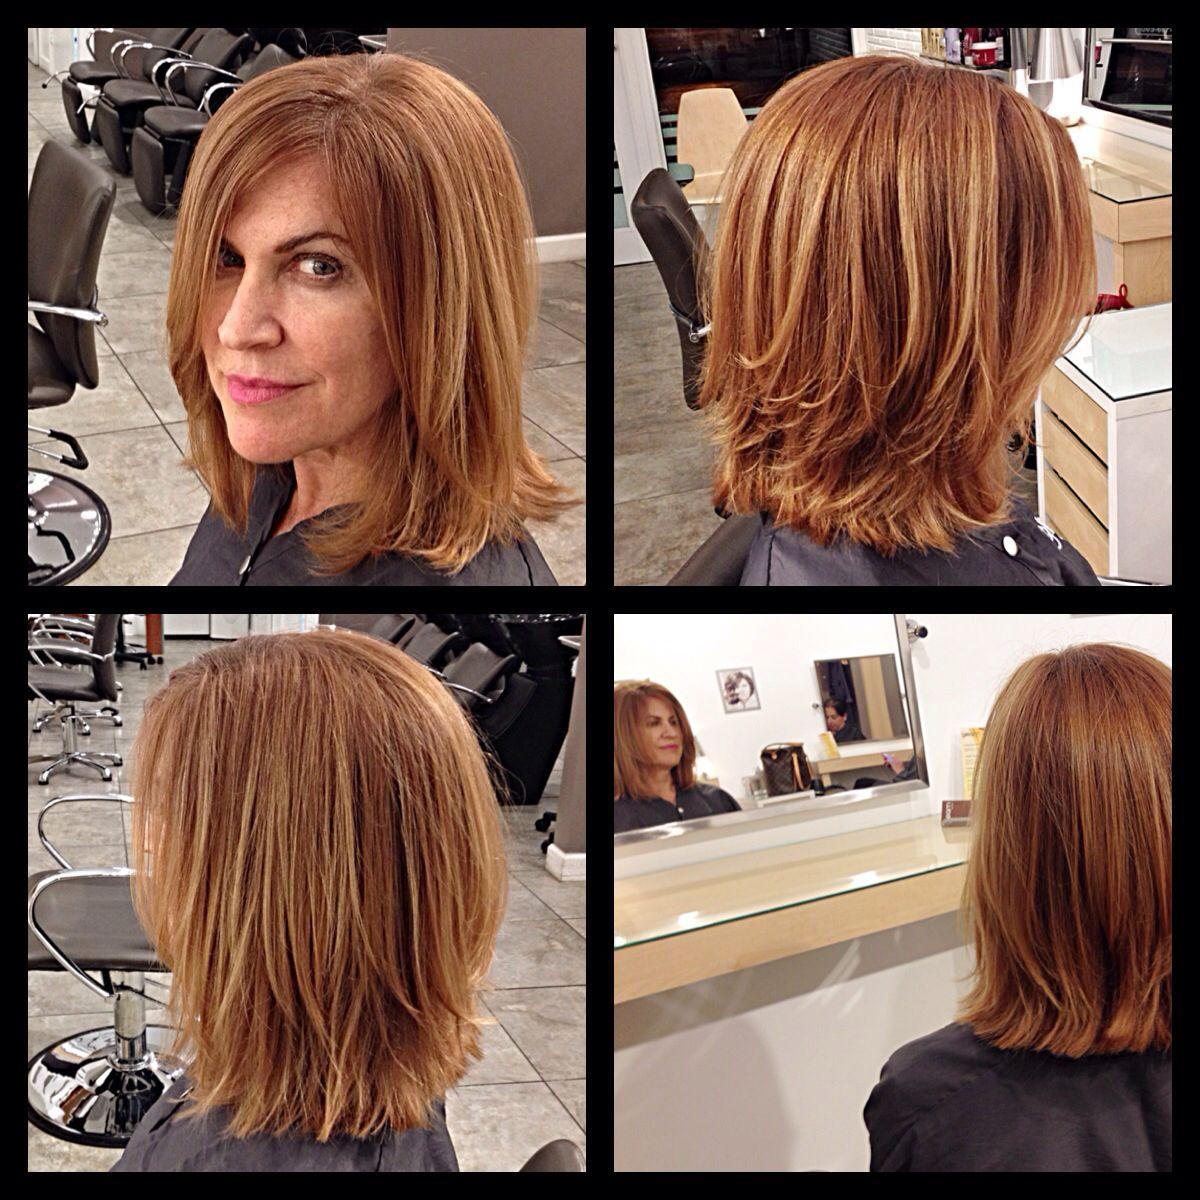 Connie's new look at Gleam Hair Studio Miami. Shoulder